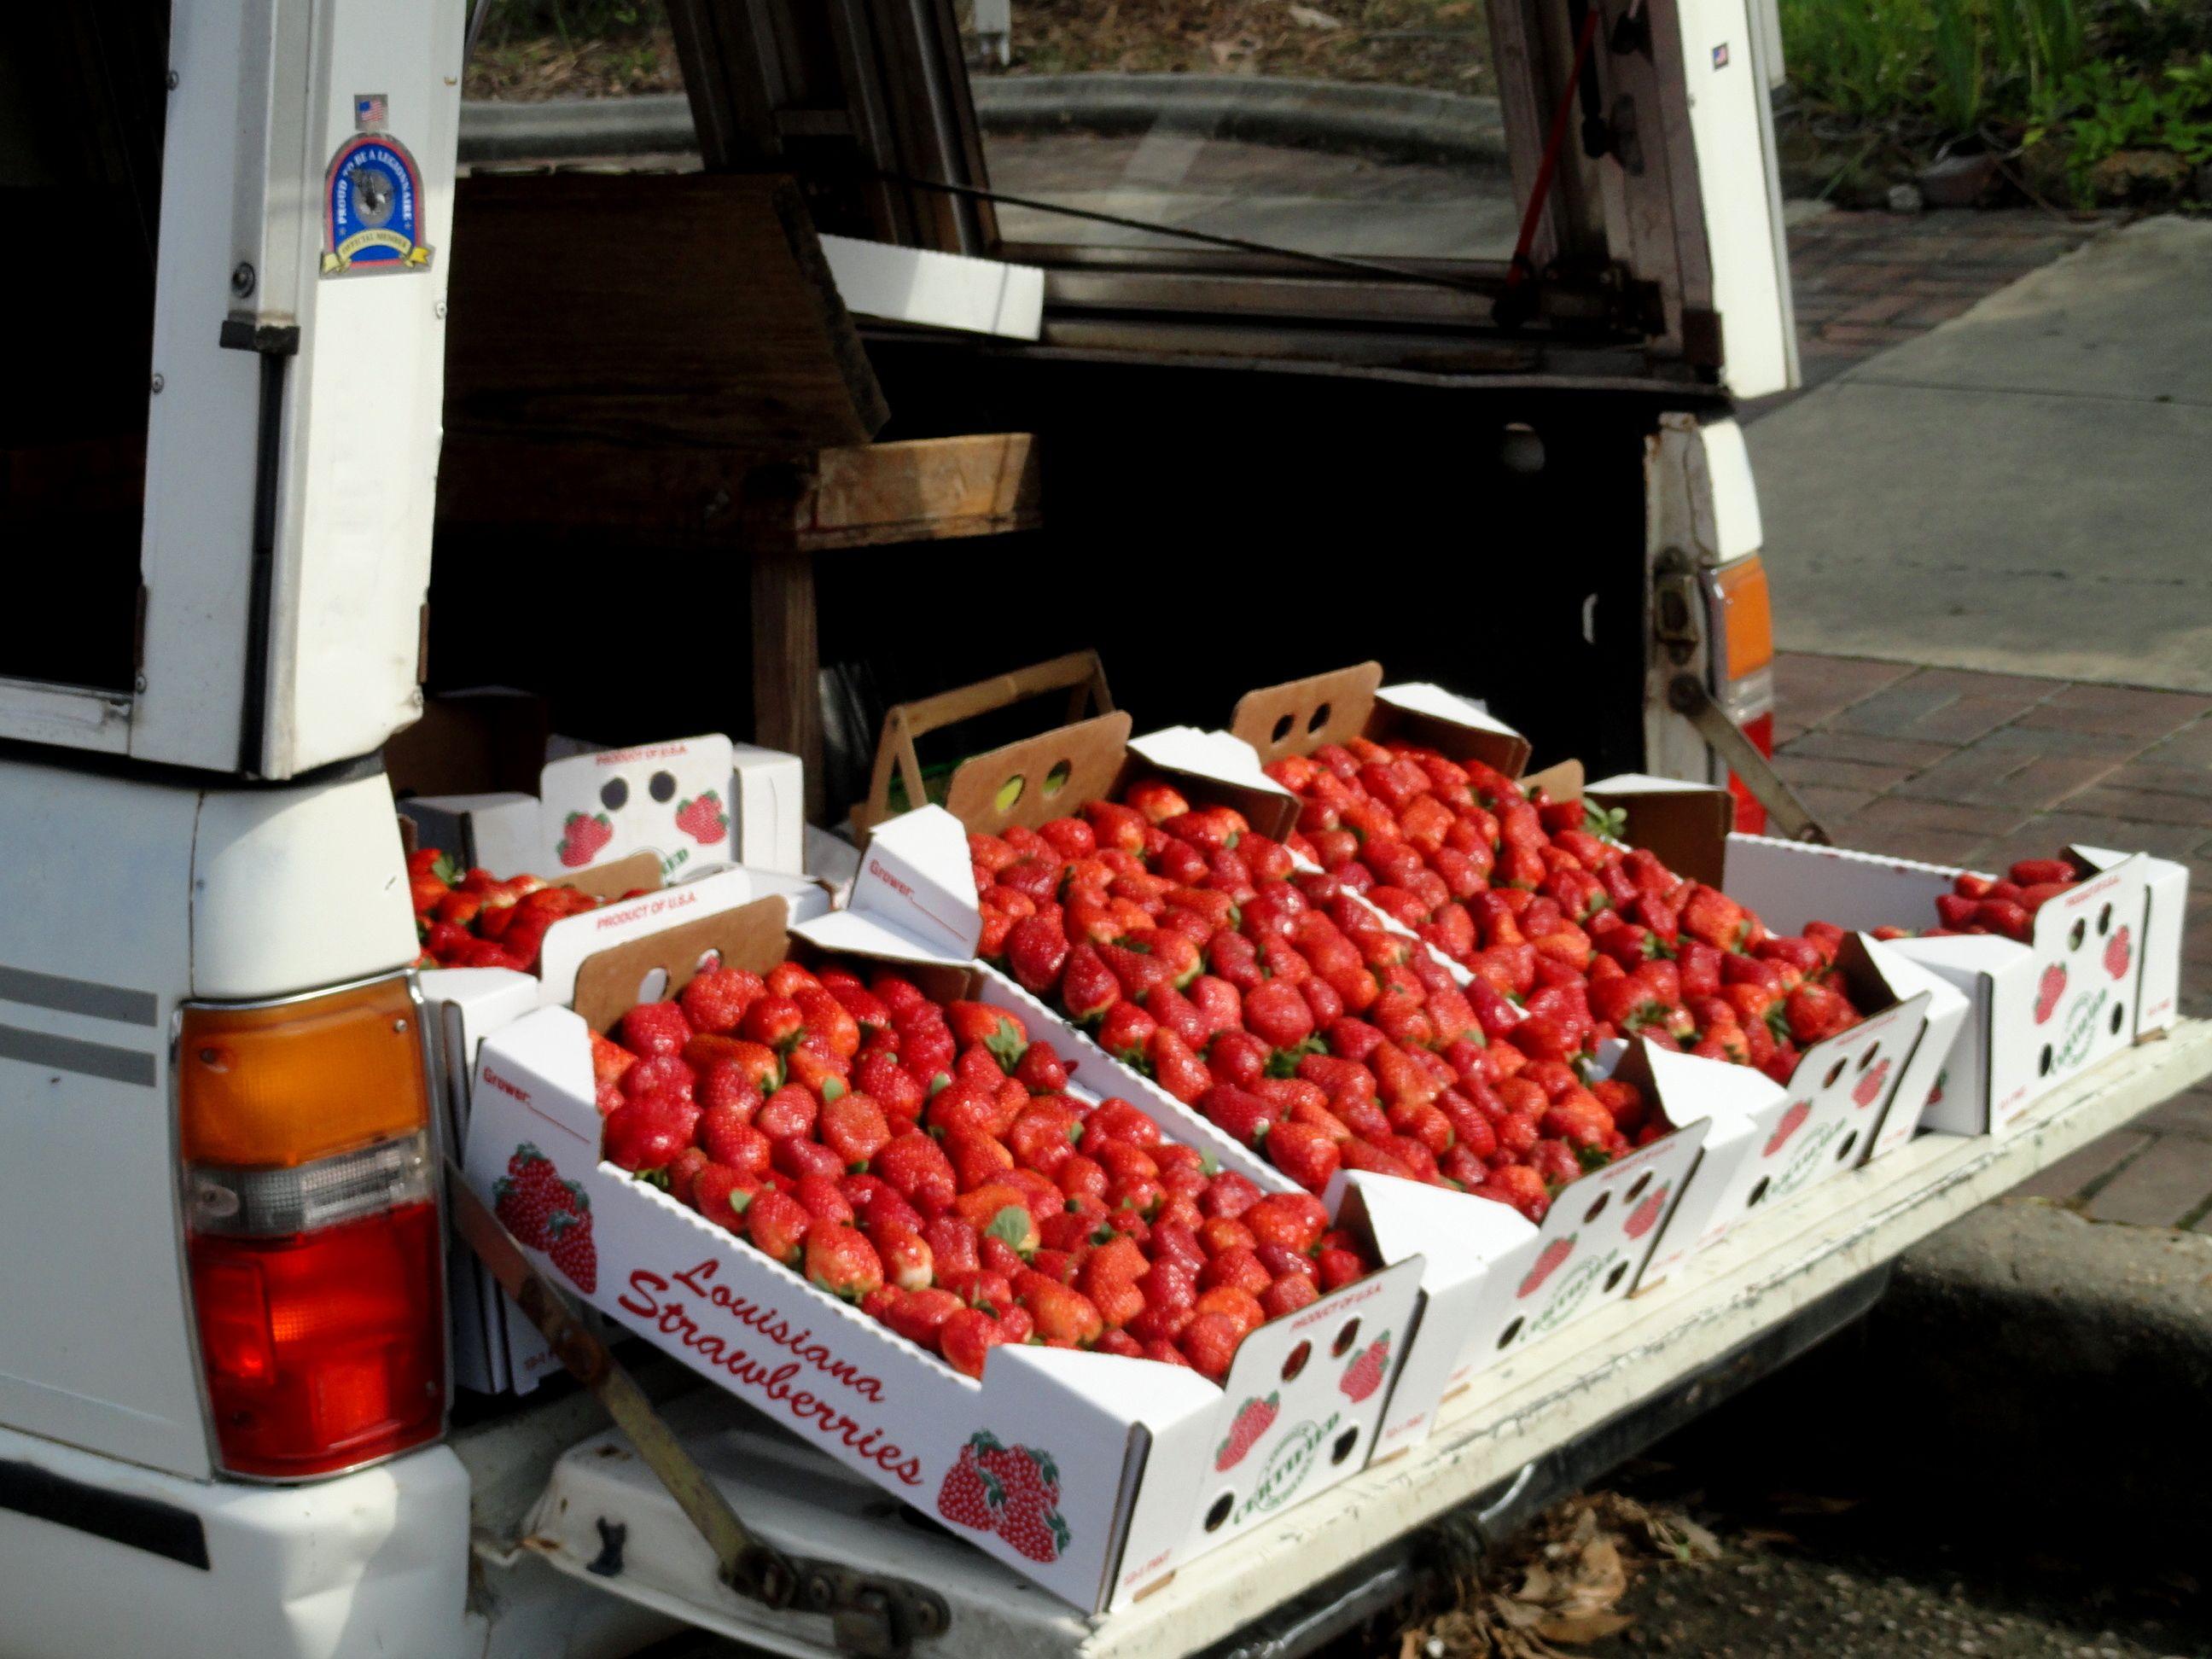 Strawberry capital of the world - Ponchatoula - Louisiana